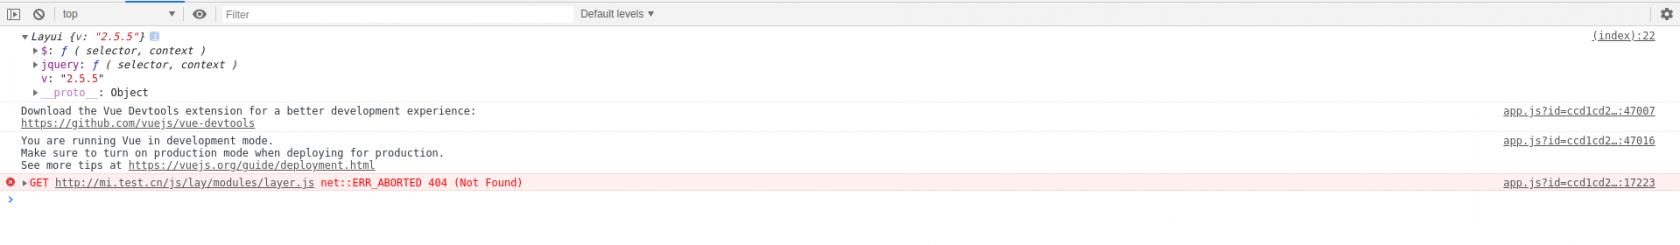 laravel下通过yarn引入layui后加载layer模块无法加载对应js